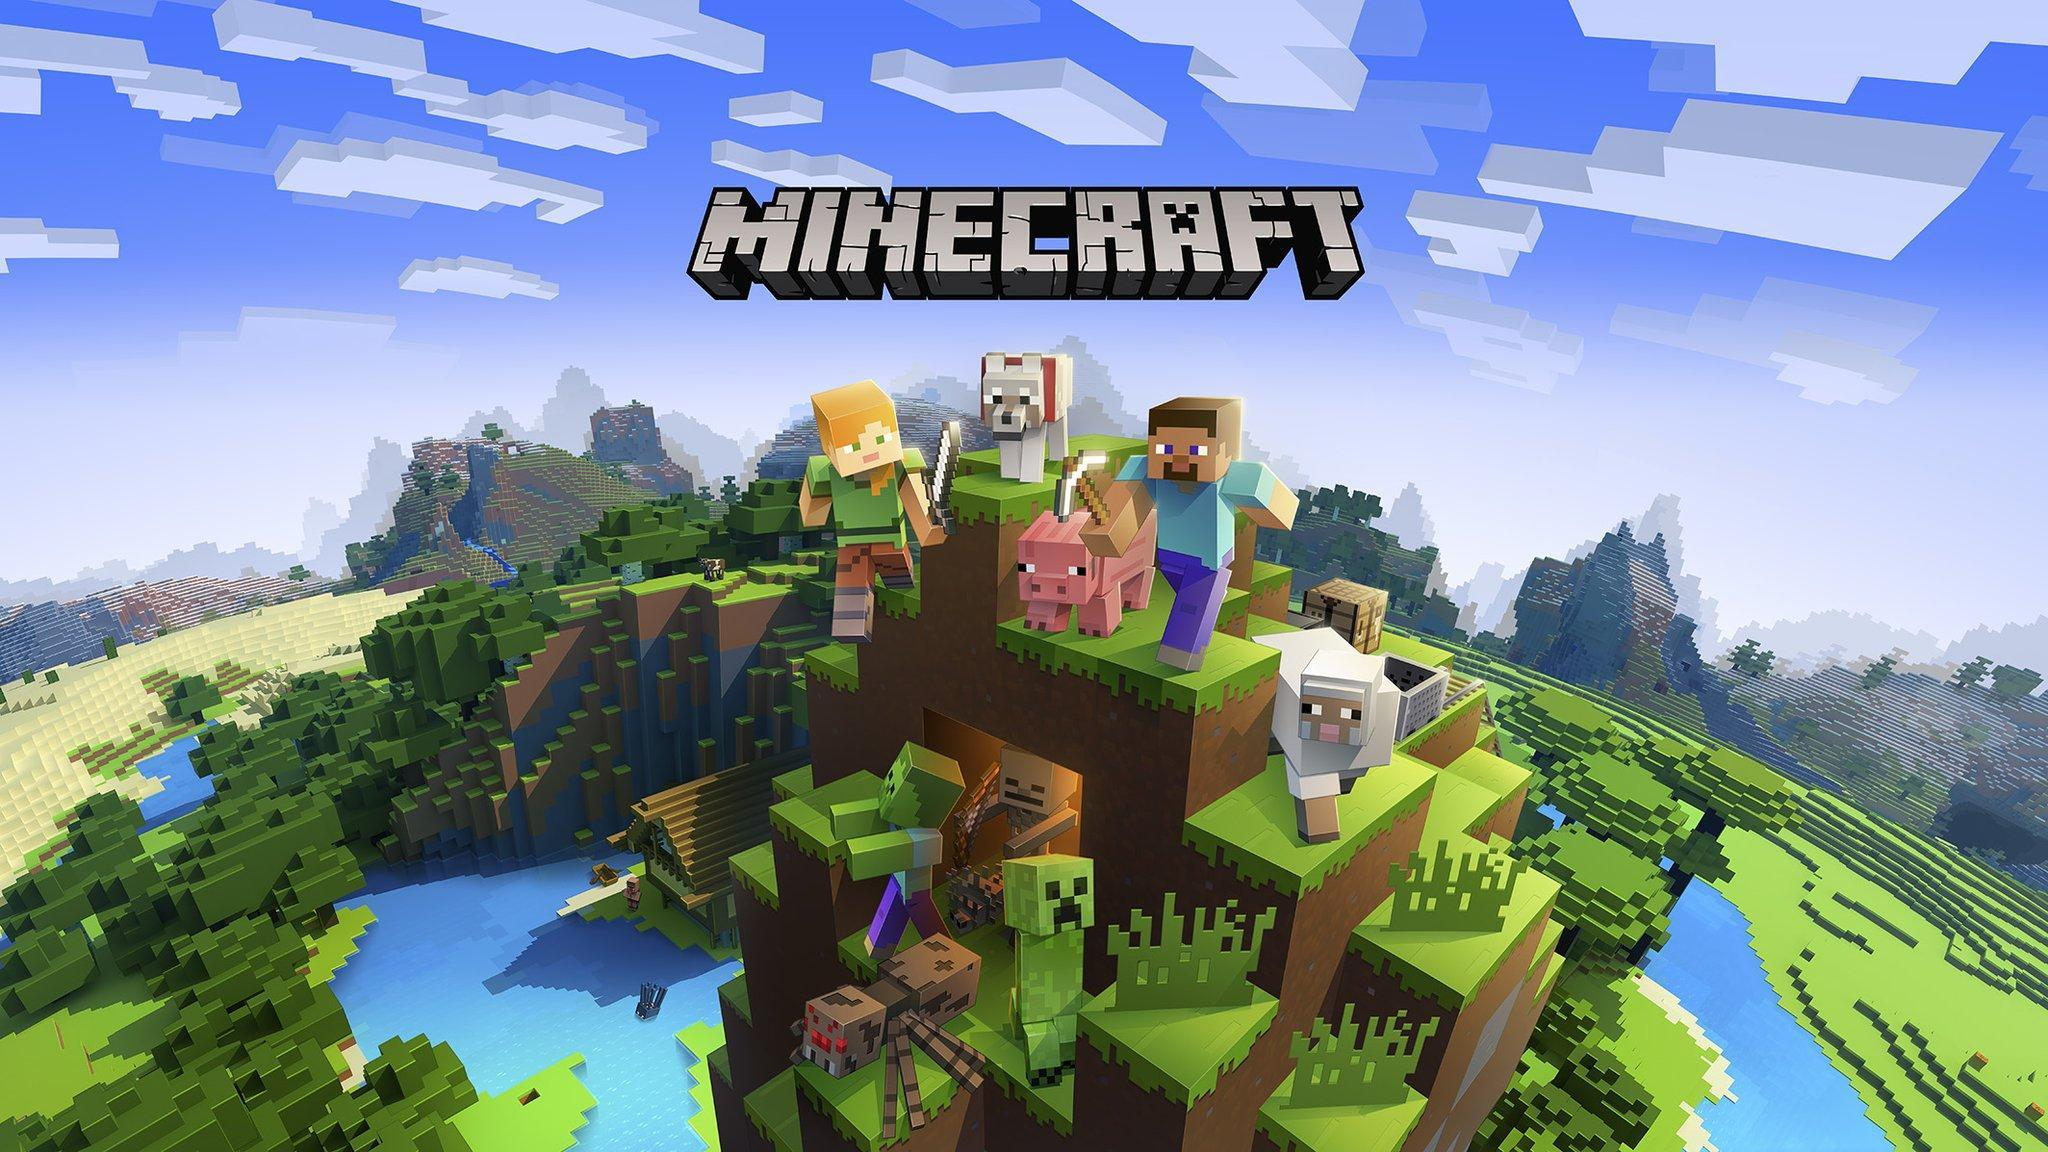 Minecraft Ps4 2048x1152 Download Hd Wallpaper Wallpapertip